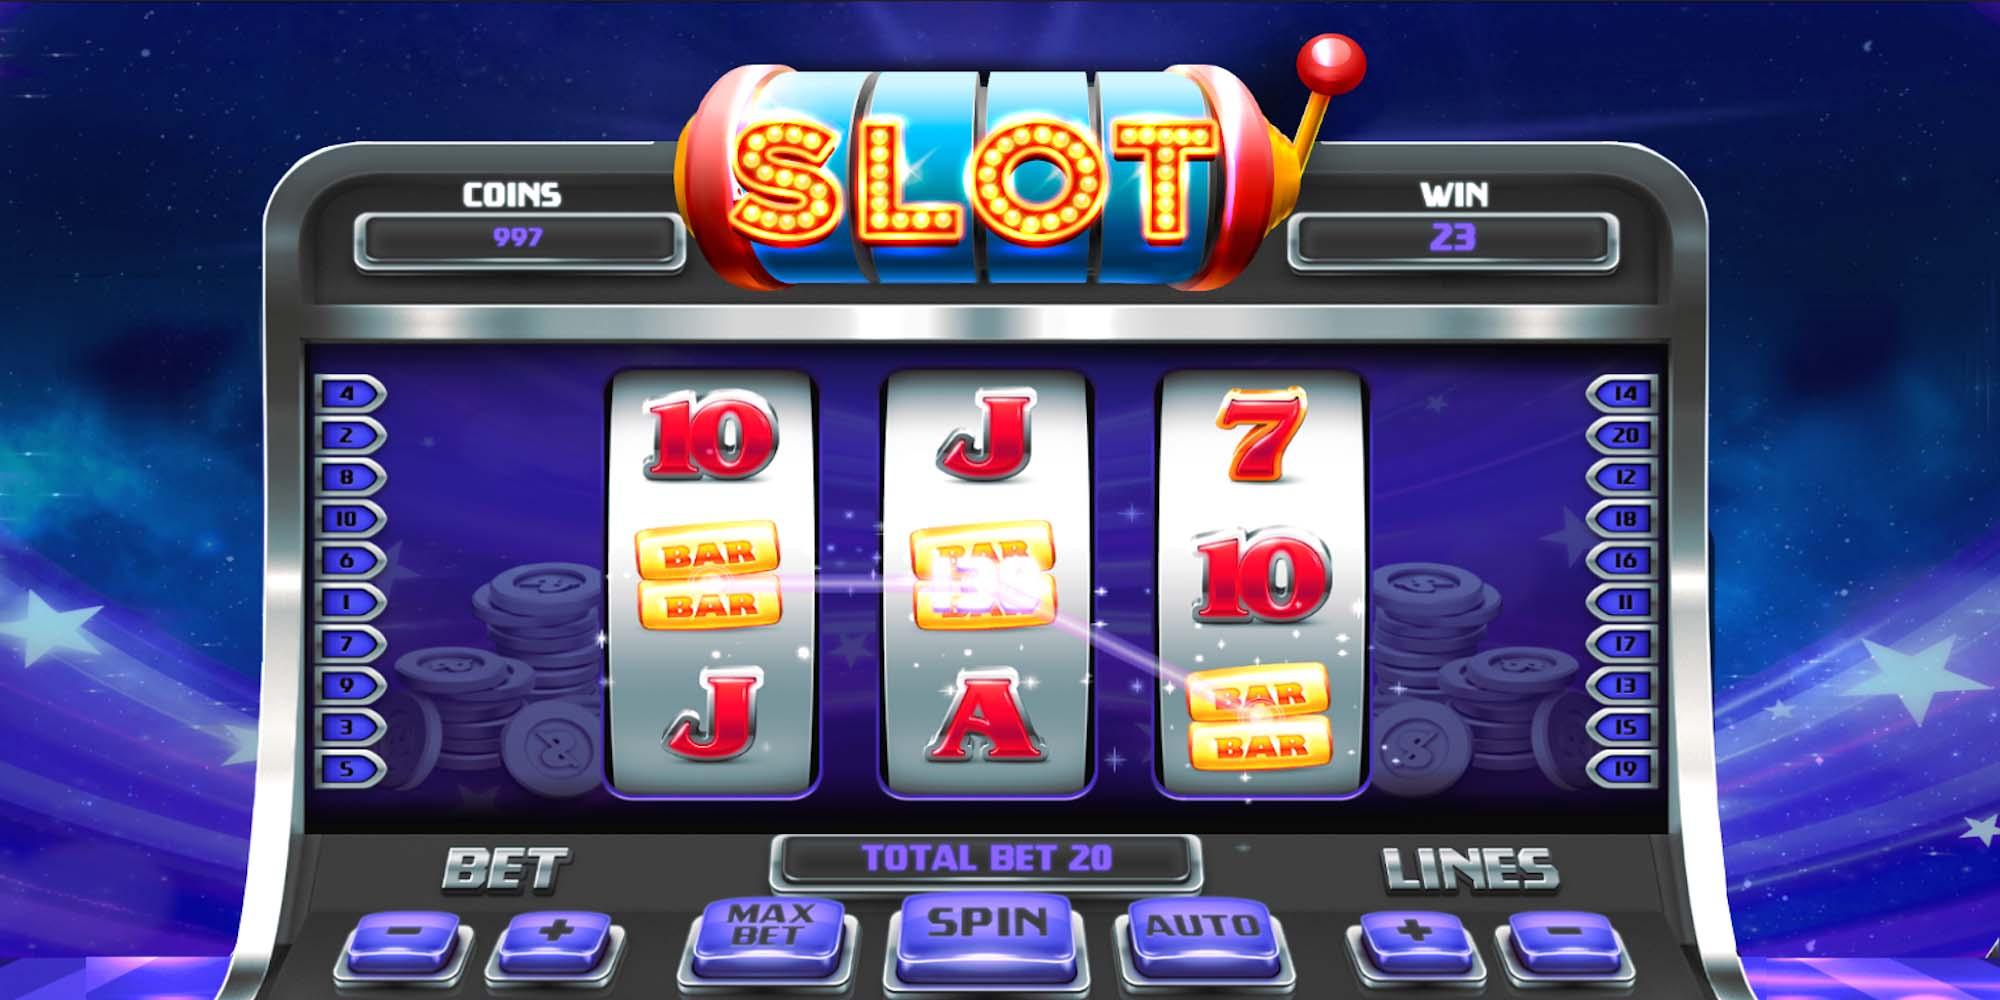 Dalam Bermain Slot Online Banyak Sekali Kejutan Keuntungan